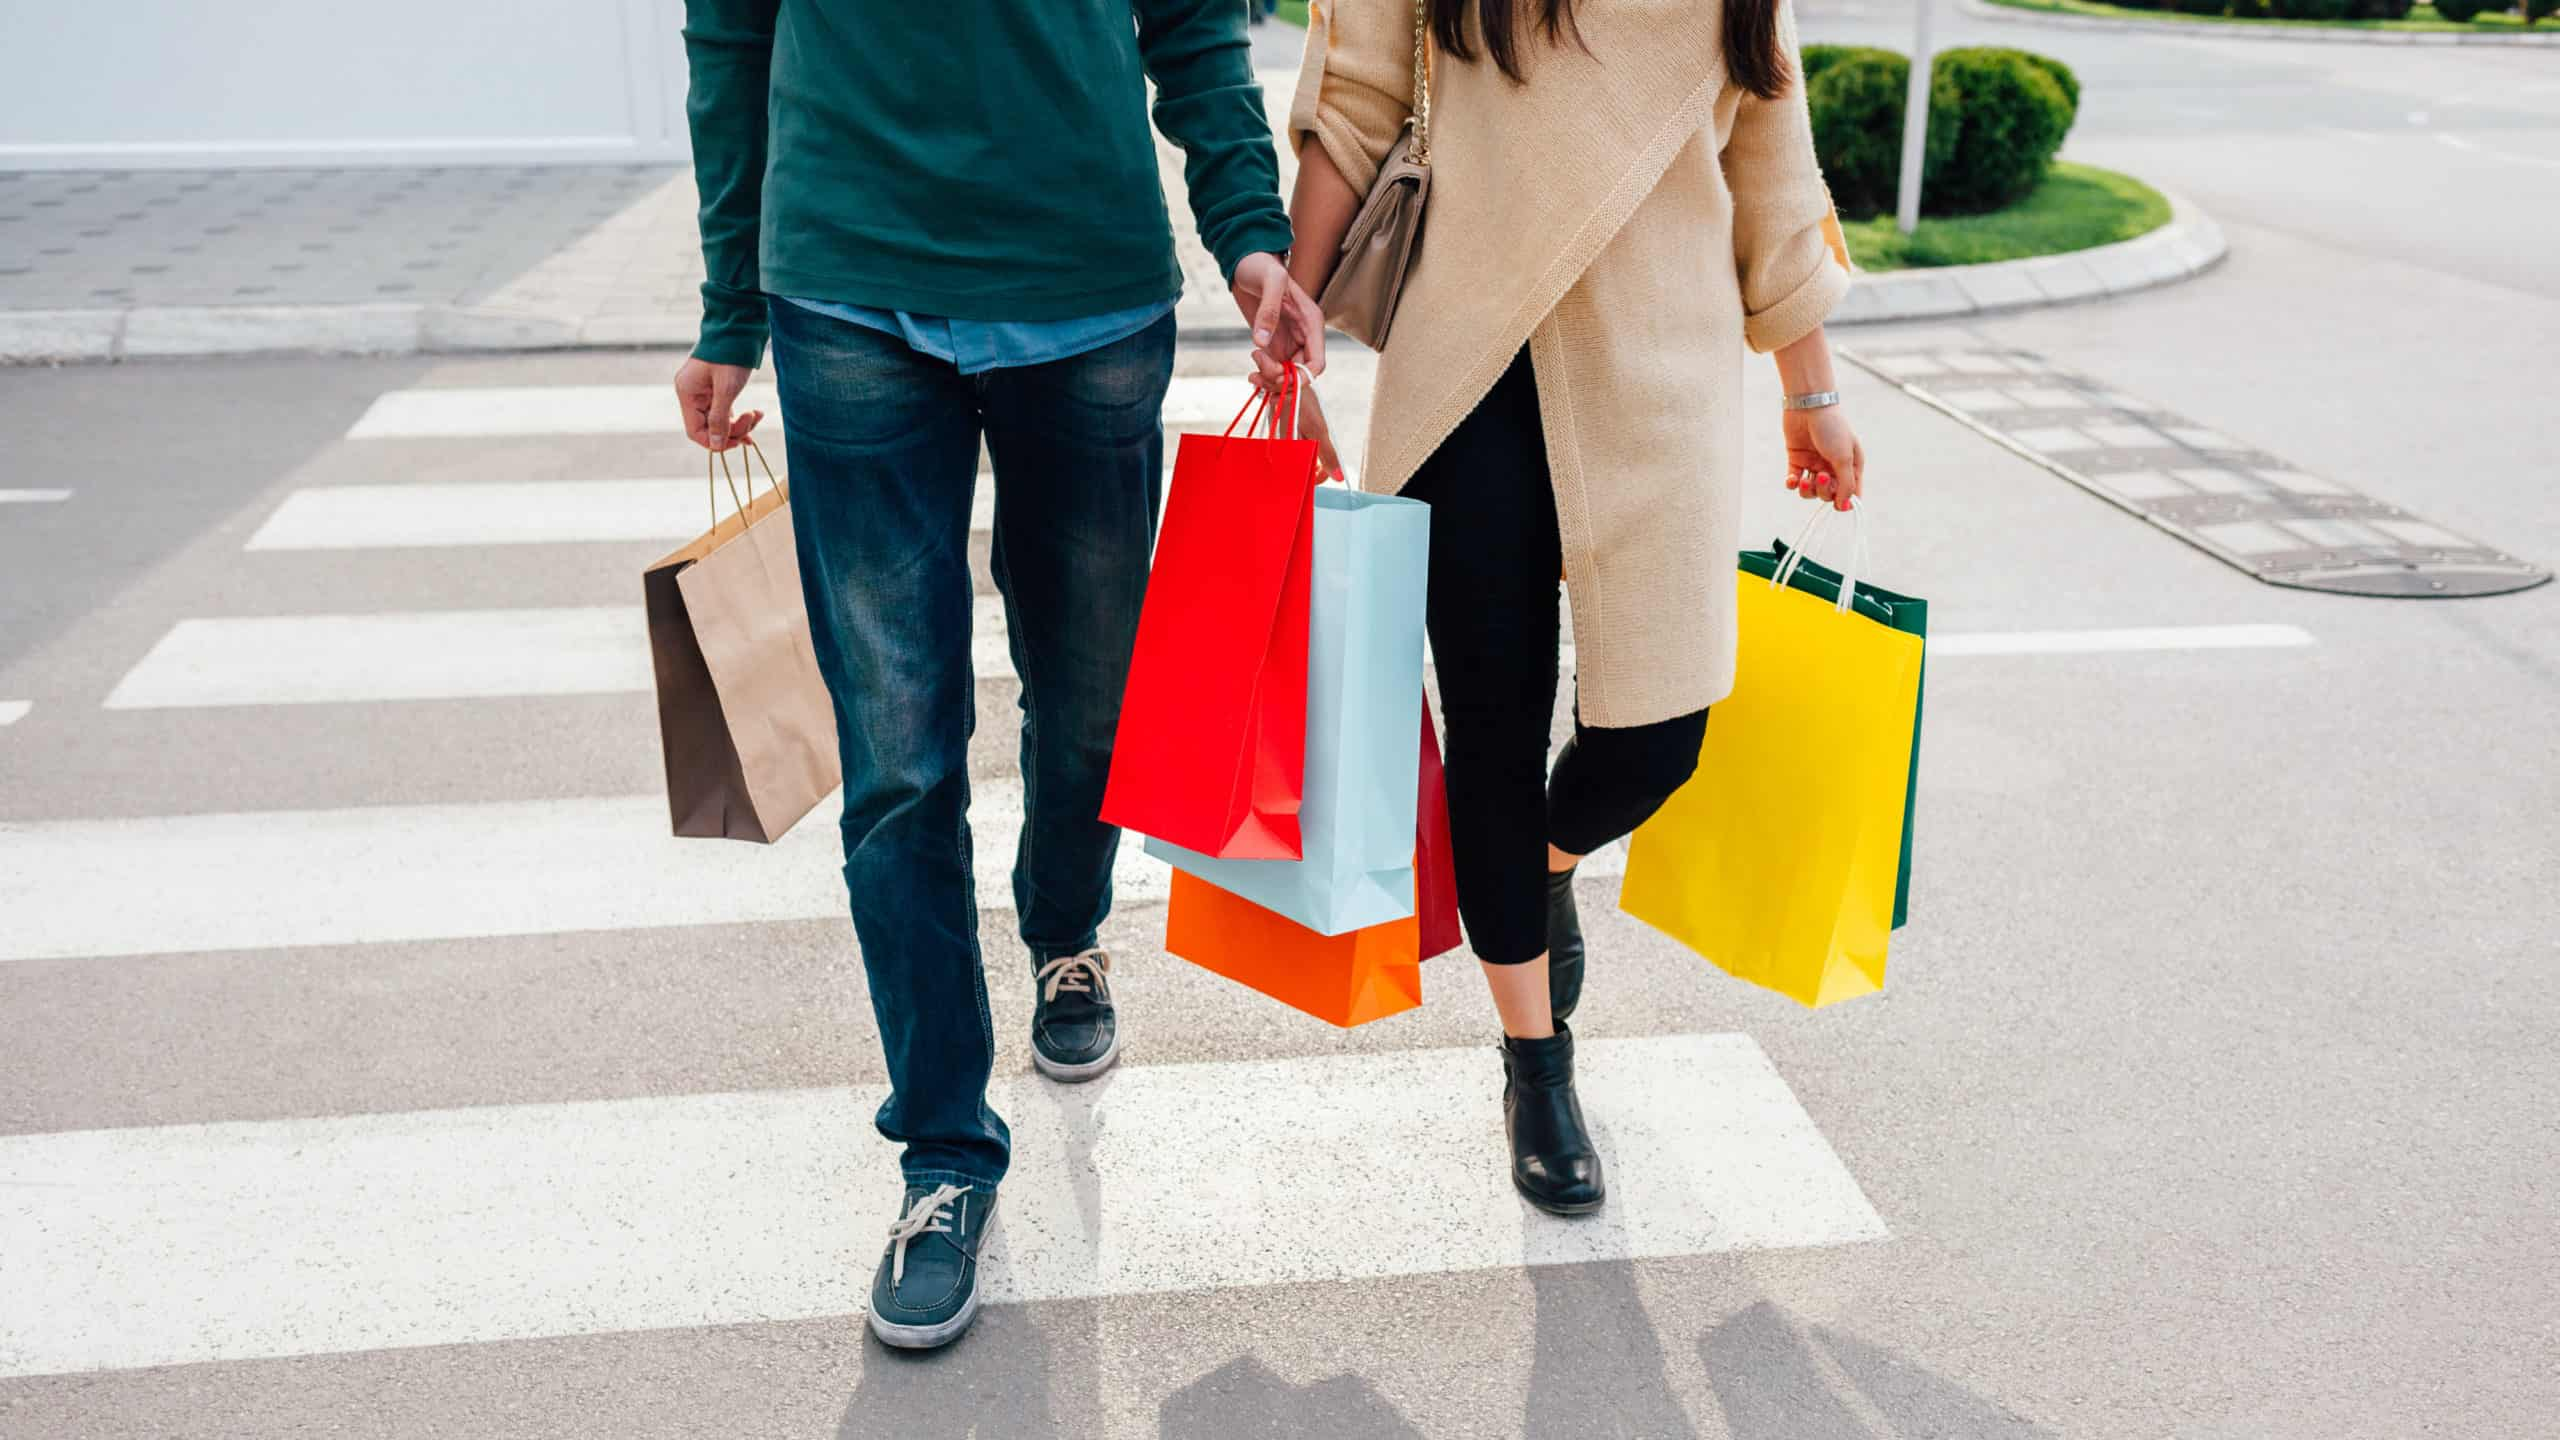 two people walking along carrying shopping bags